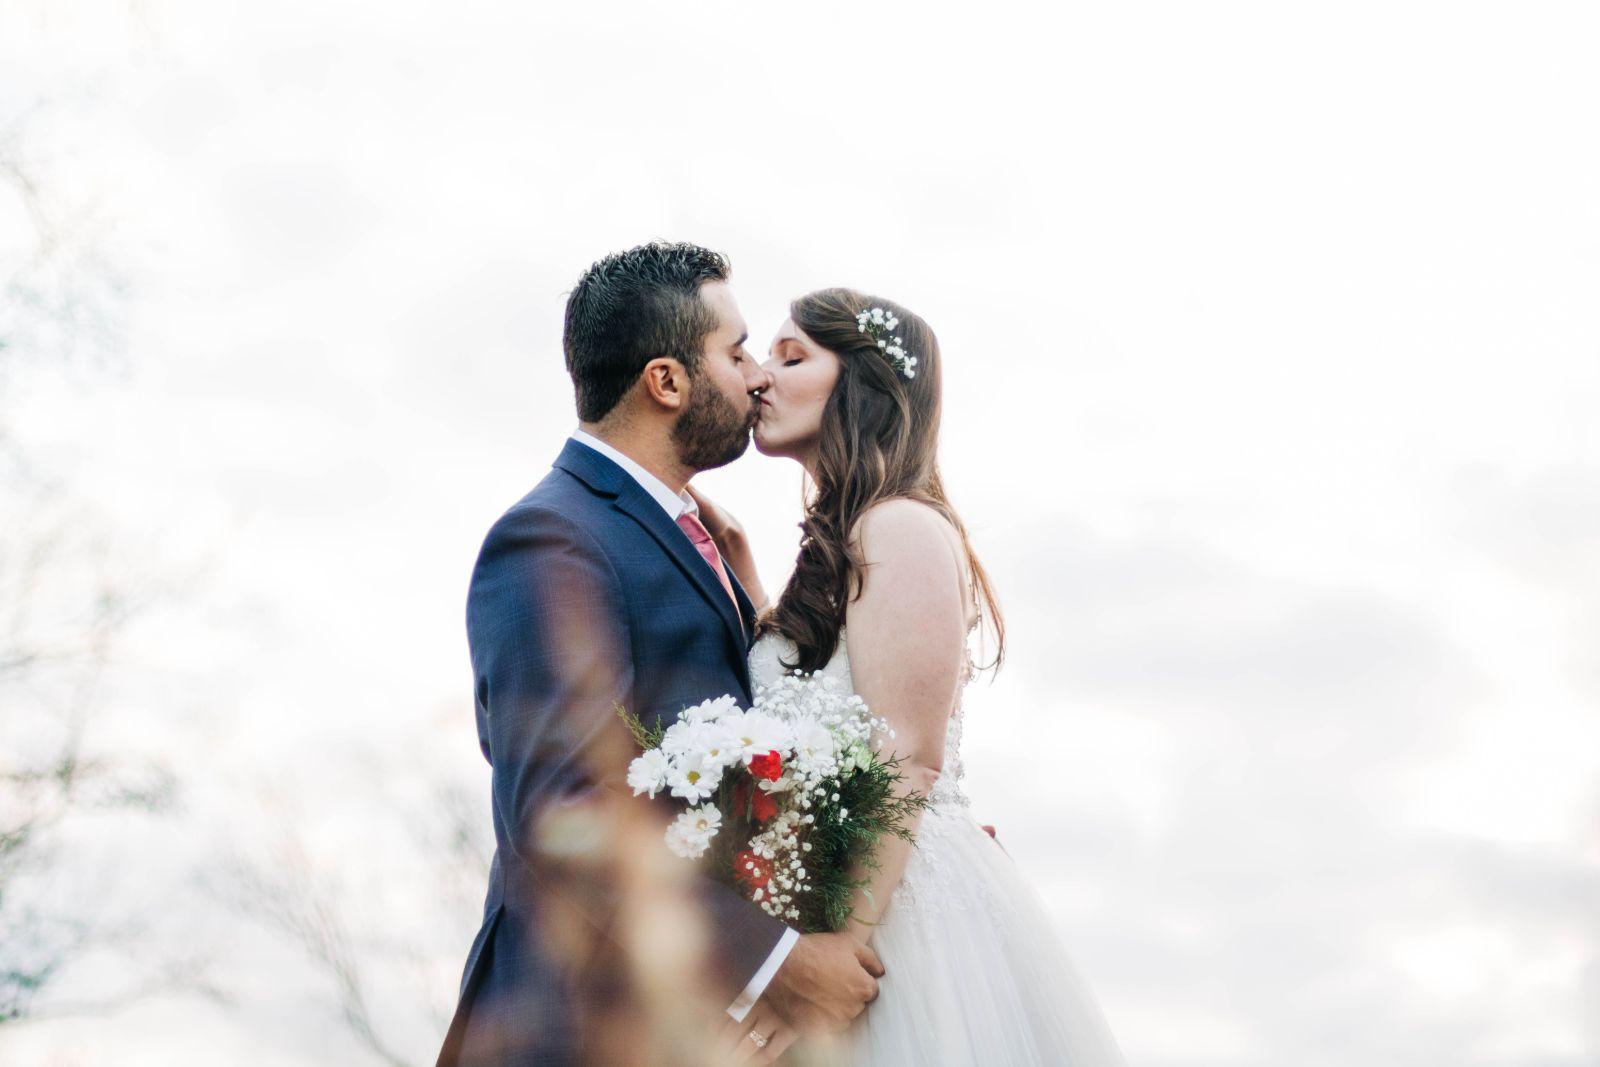 outdoor ceremony - wedding celebrant in Bristol